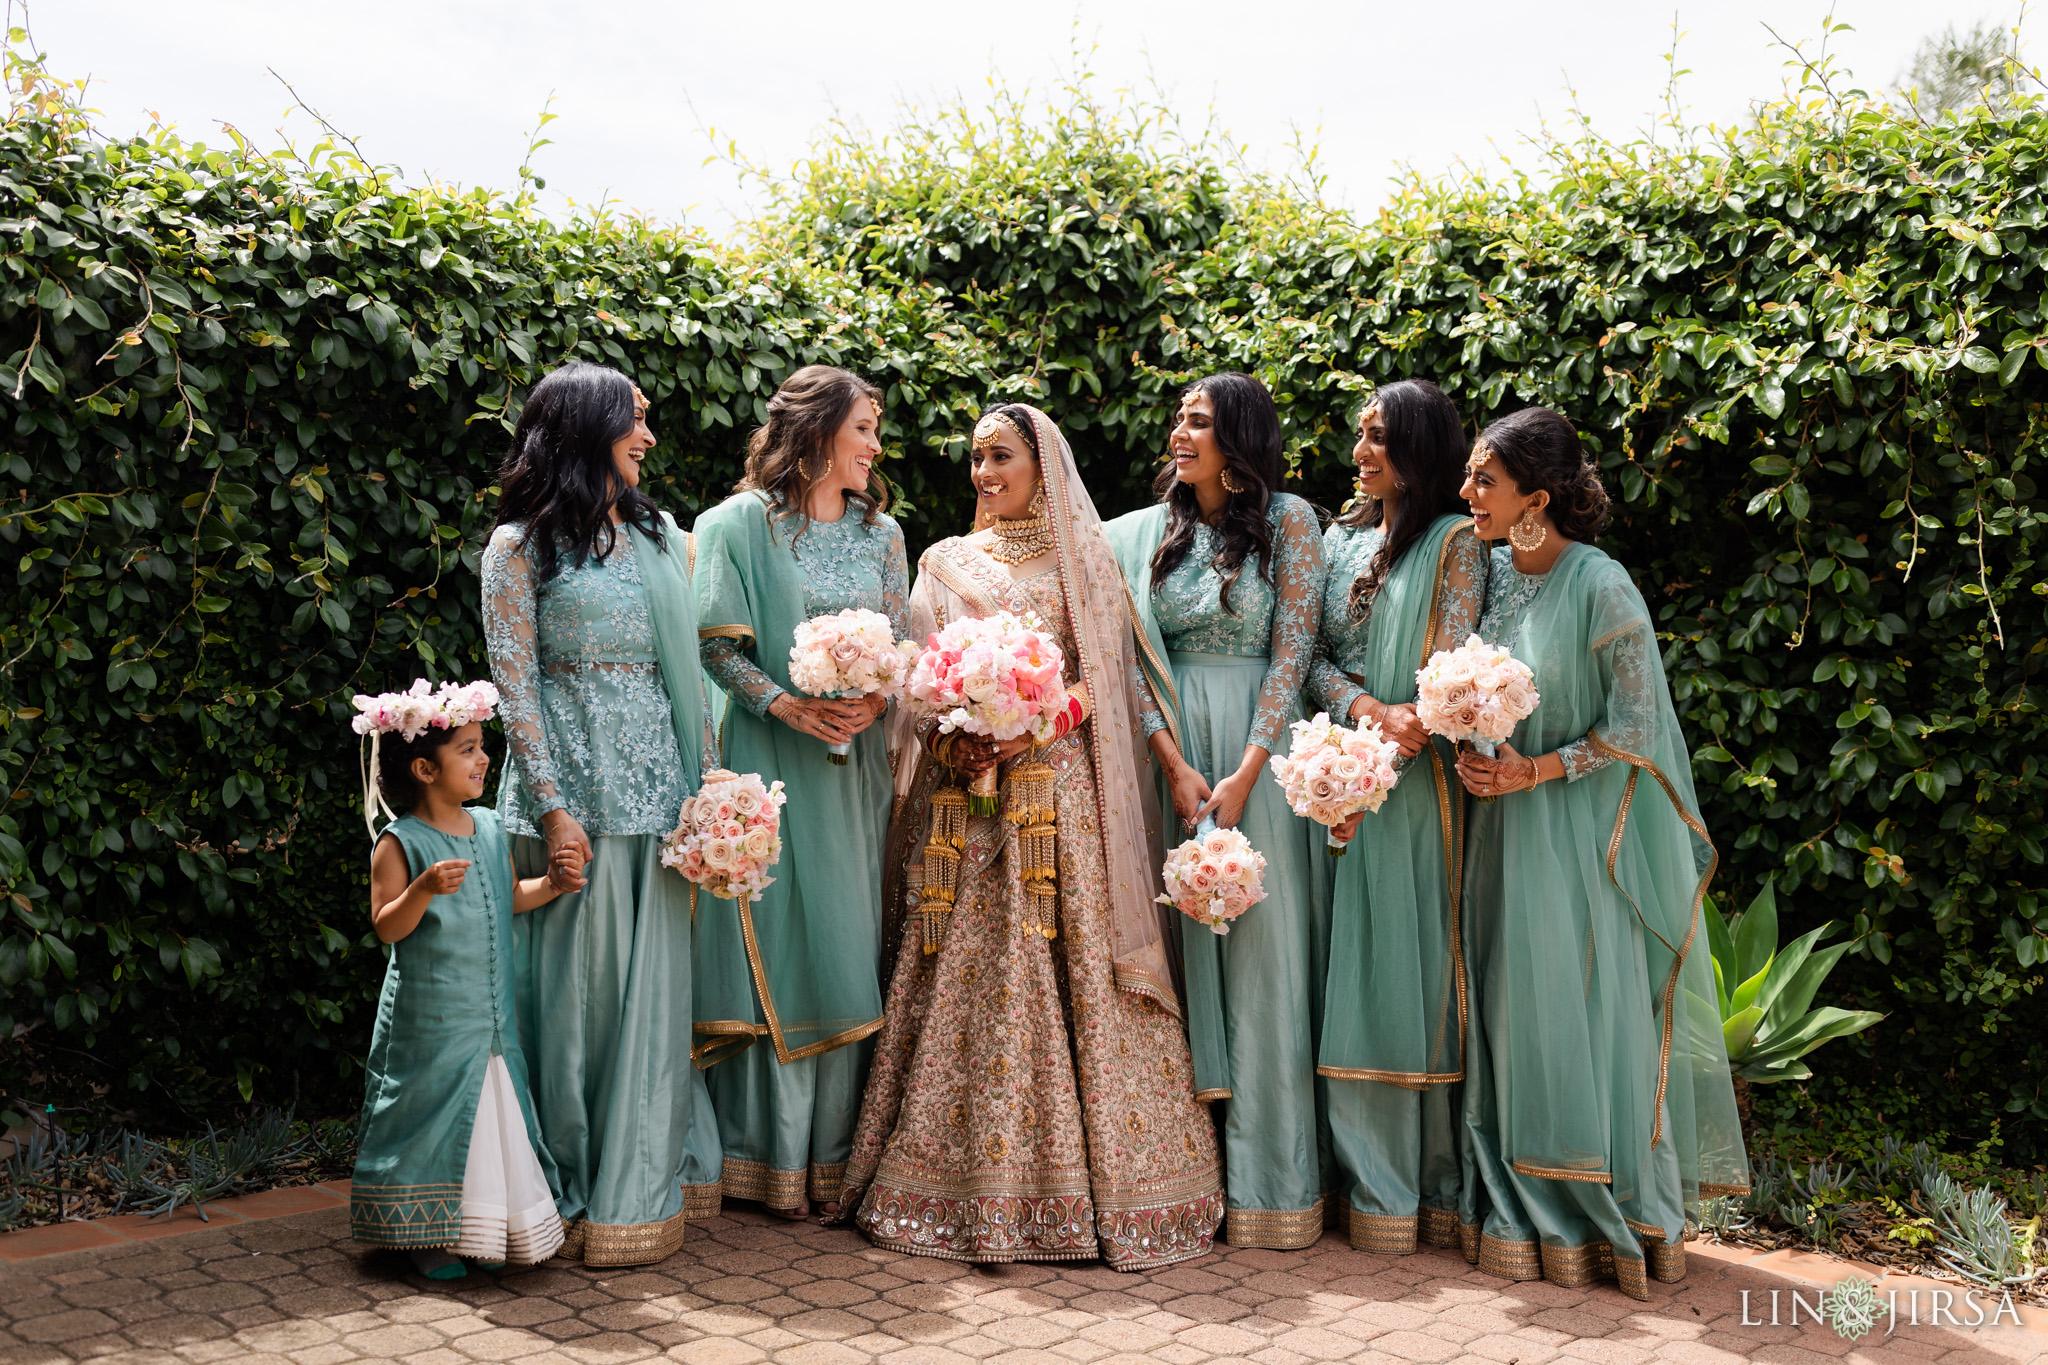 09 Hilton Santa Barbara Beachfront Resort Punjabi Indian Wedding Ceremony Photography